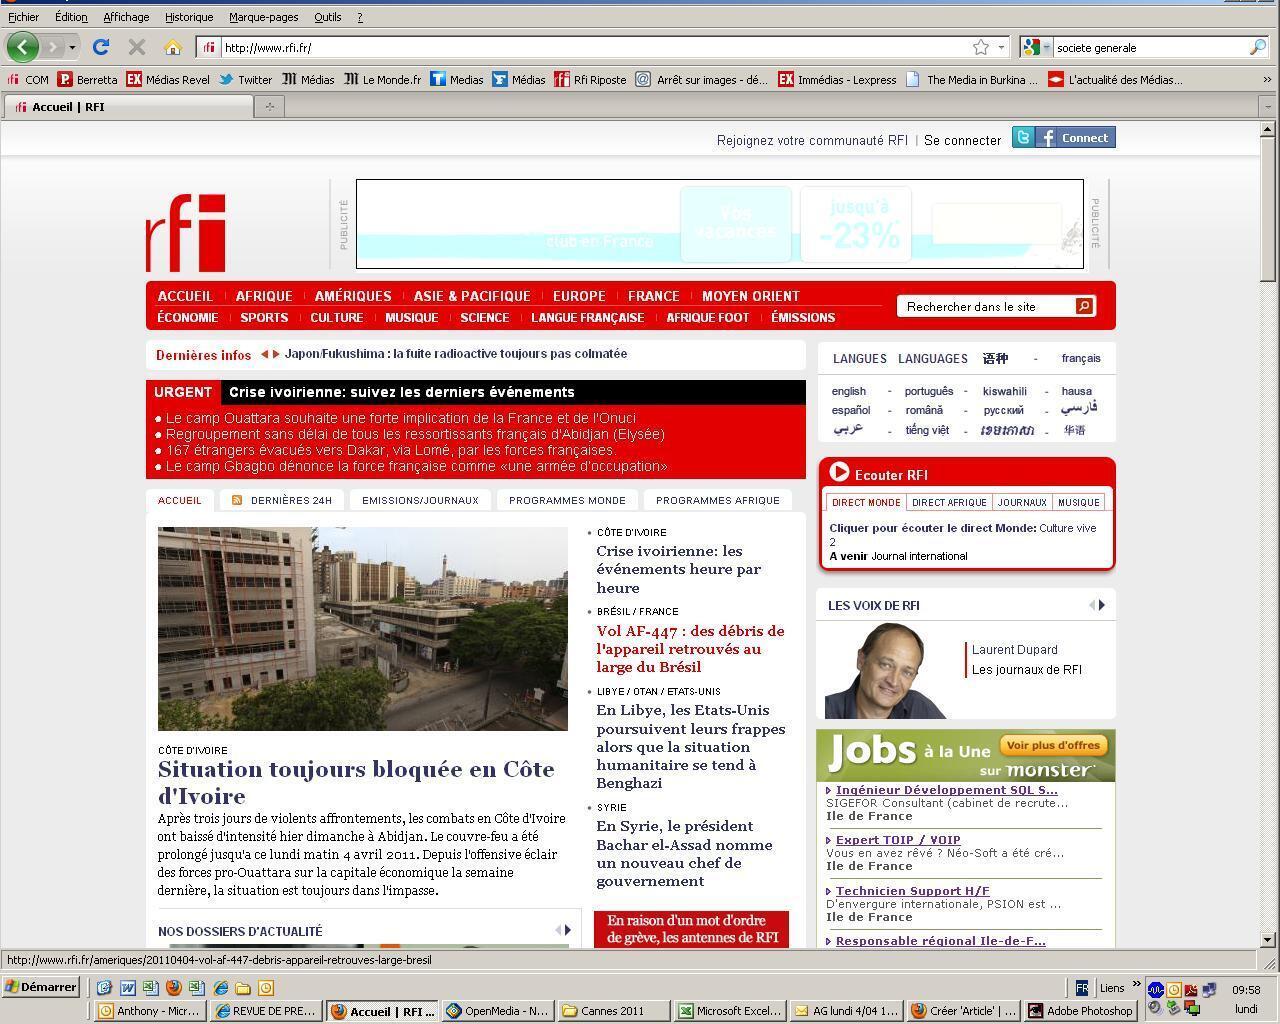 Rfi.fr au premier rang des sites d'information